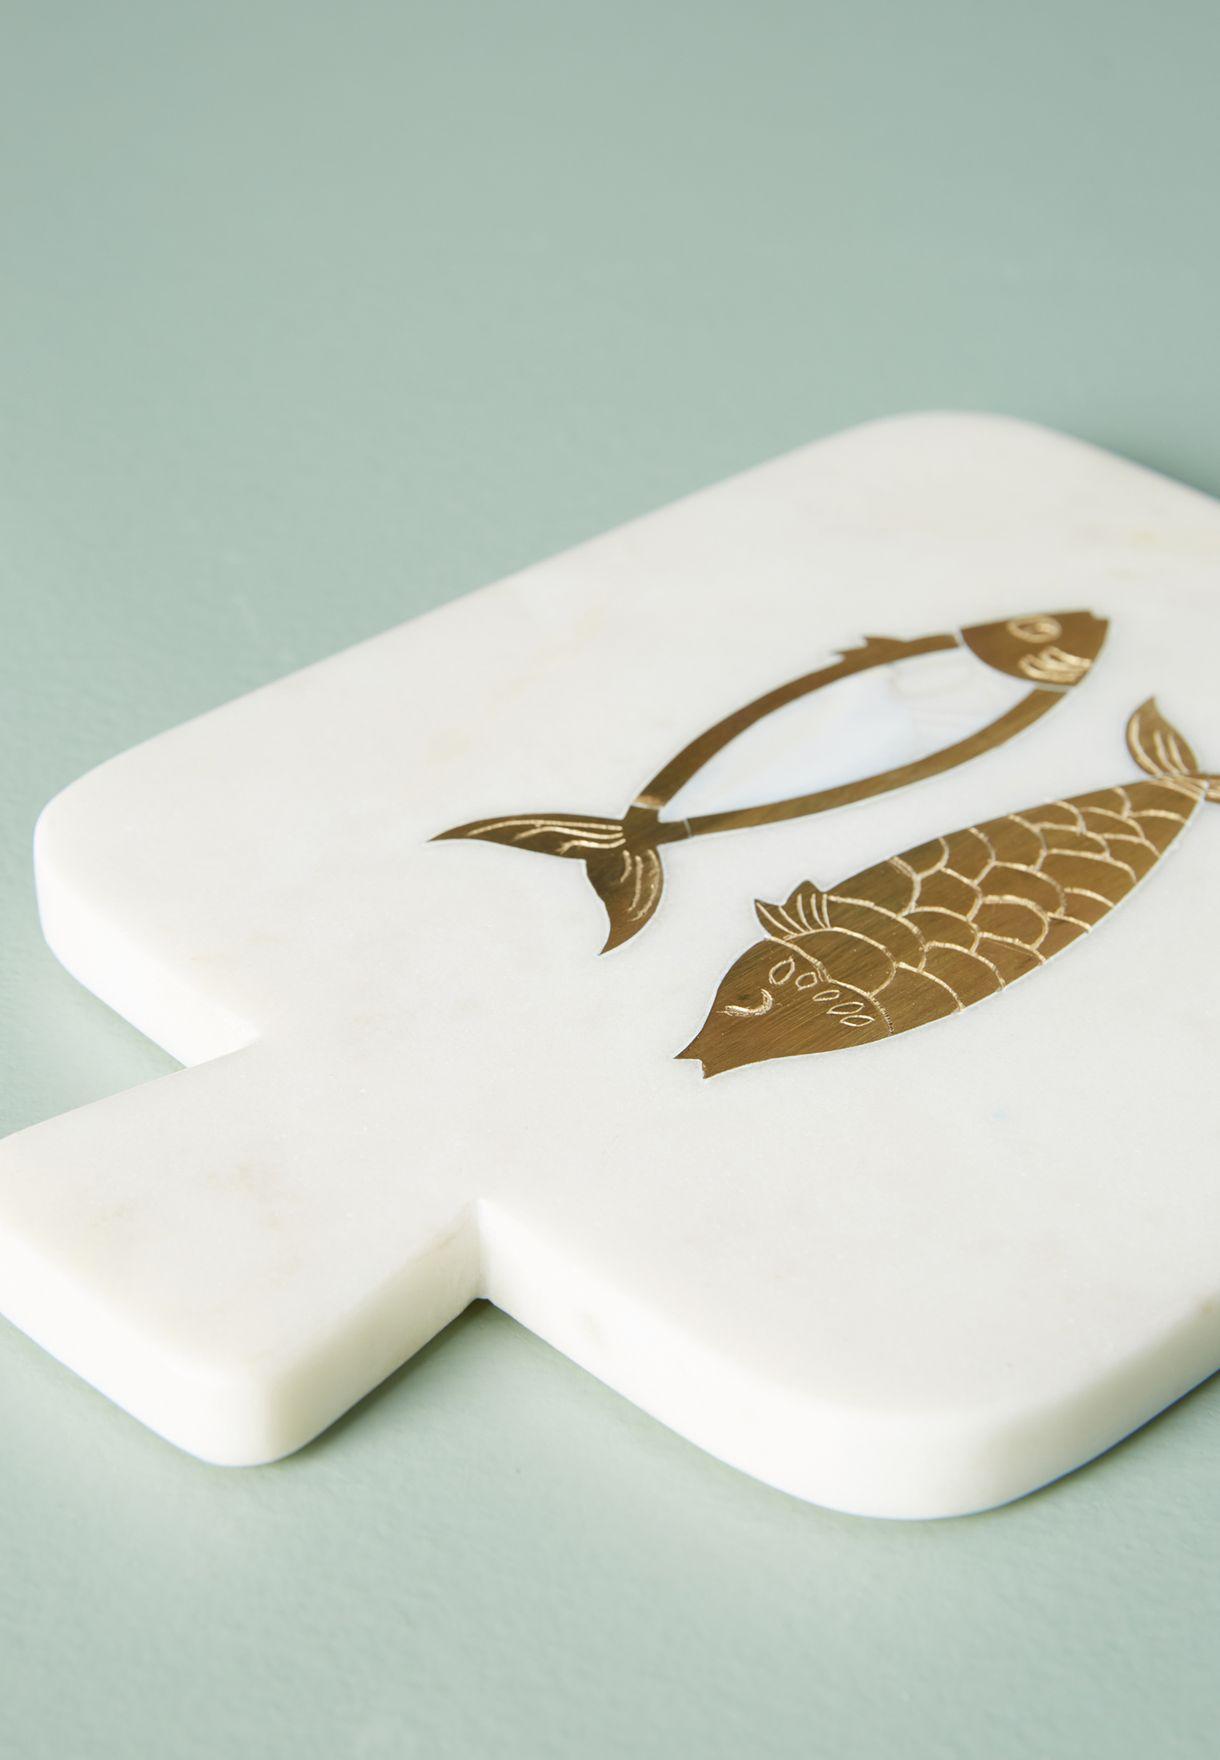 Small Sardine Cheese Board